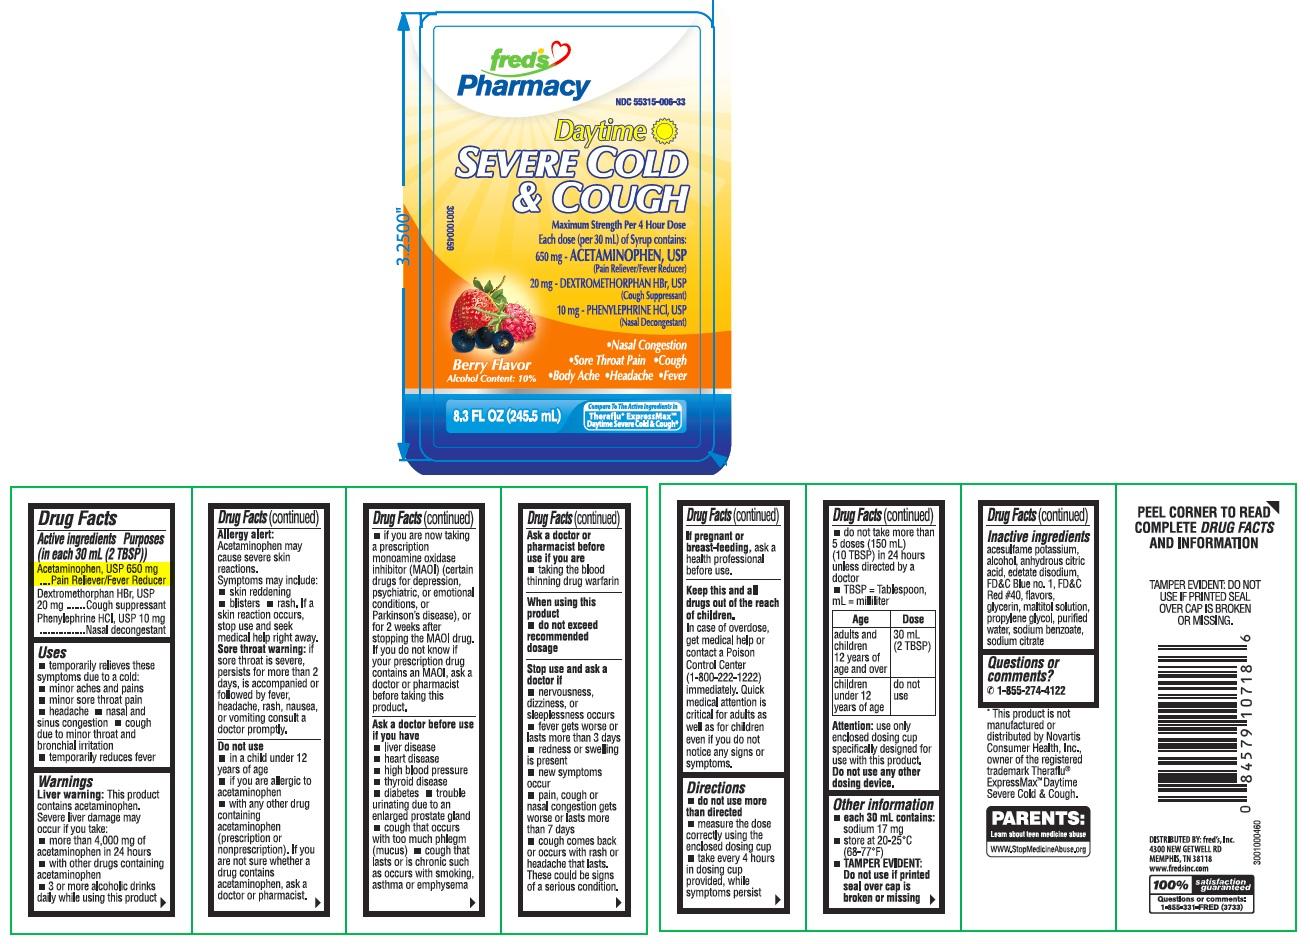 PACKAGE LABEL-PRINCIPAL DISPLAY PANEL - 8.3 FL OZ (245.5 mL Bottle)